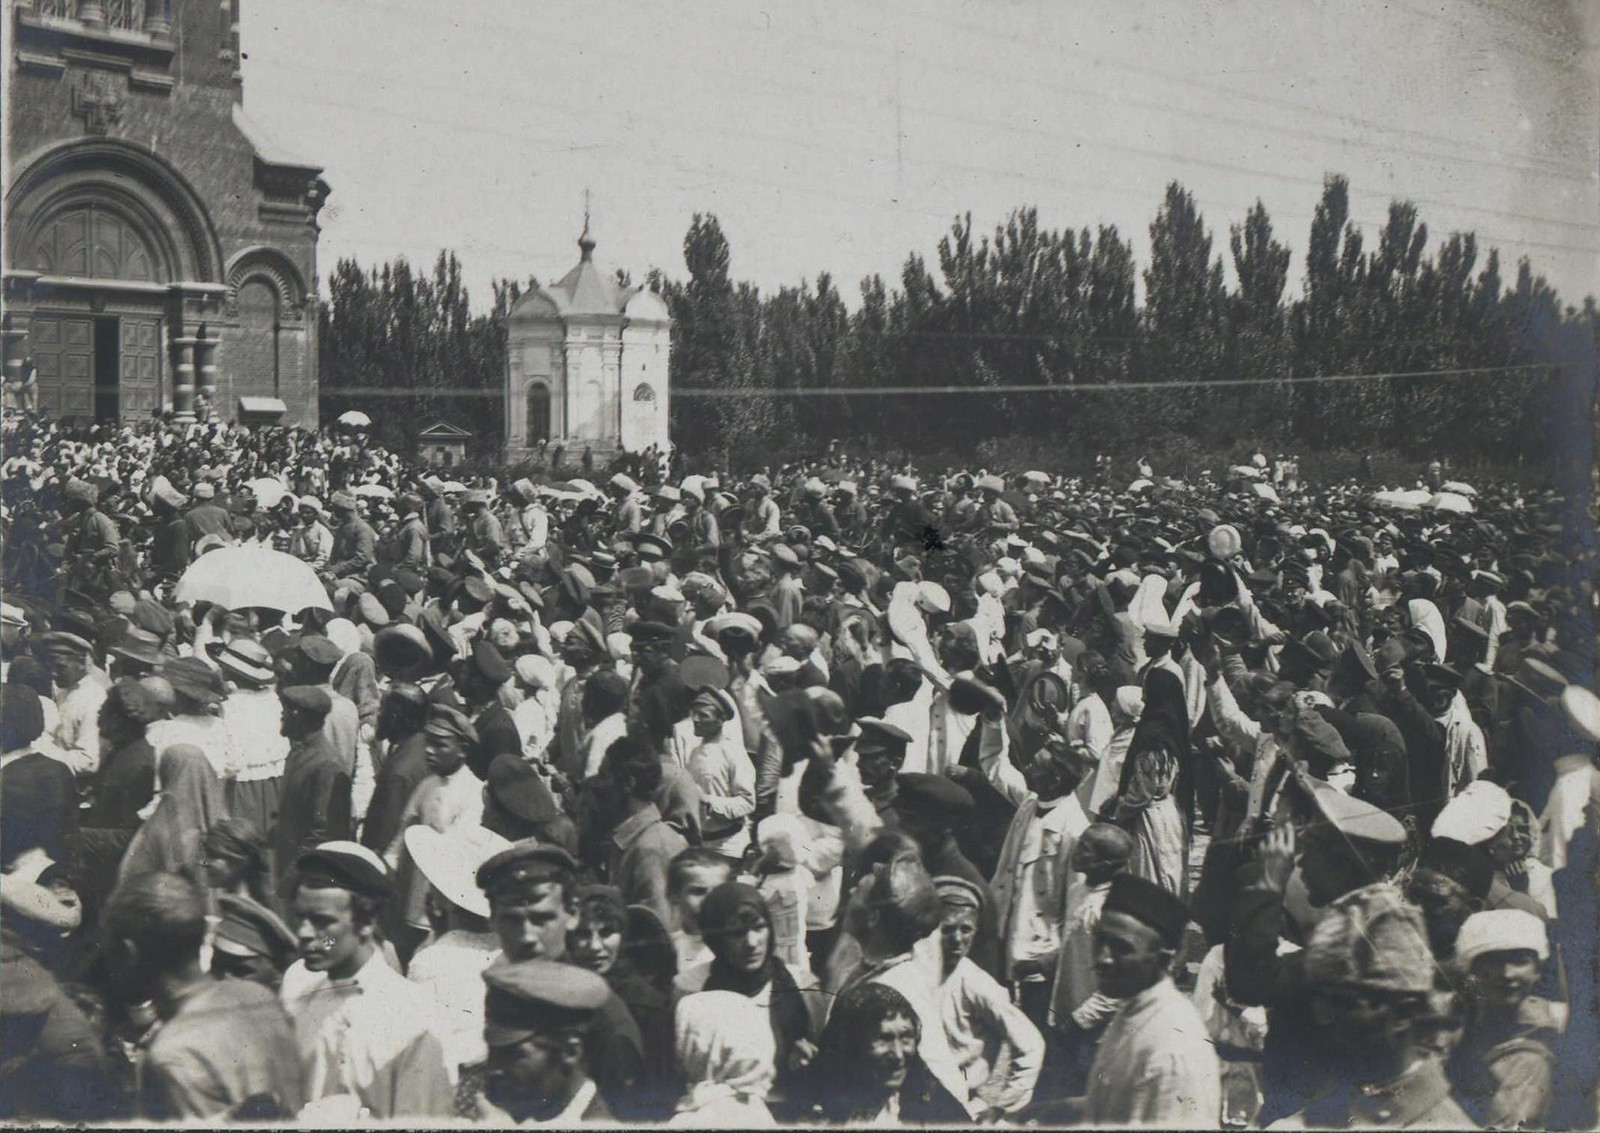 132. 1919. Парад в Царицыне. Горожане следят за происходящим